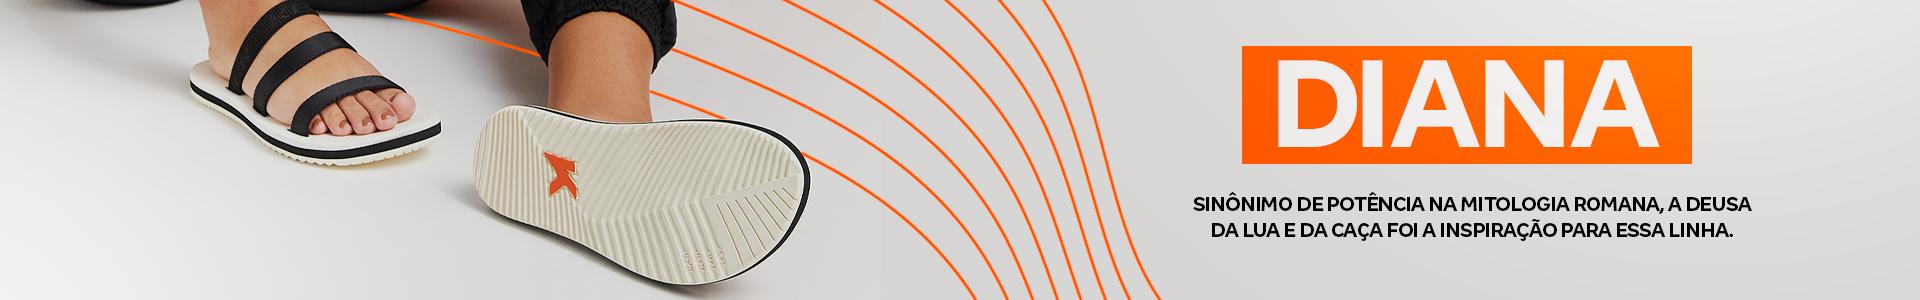 banner-desktop-diana